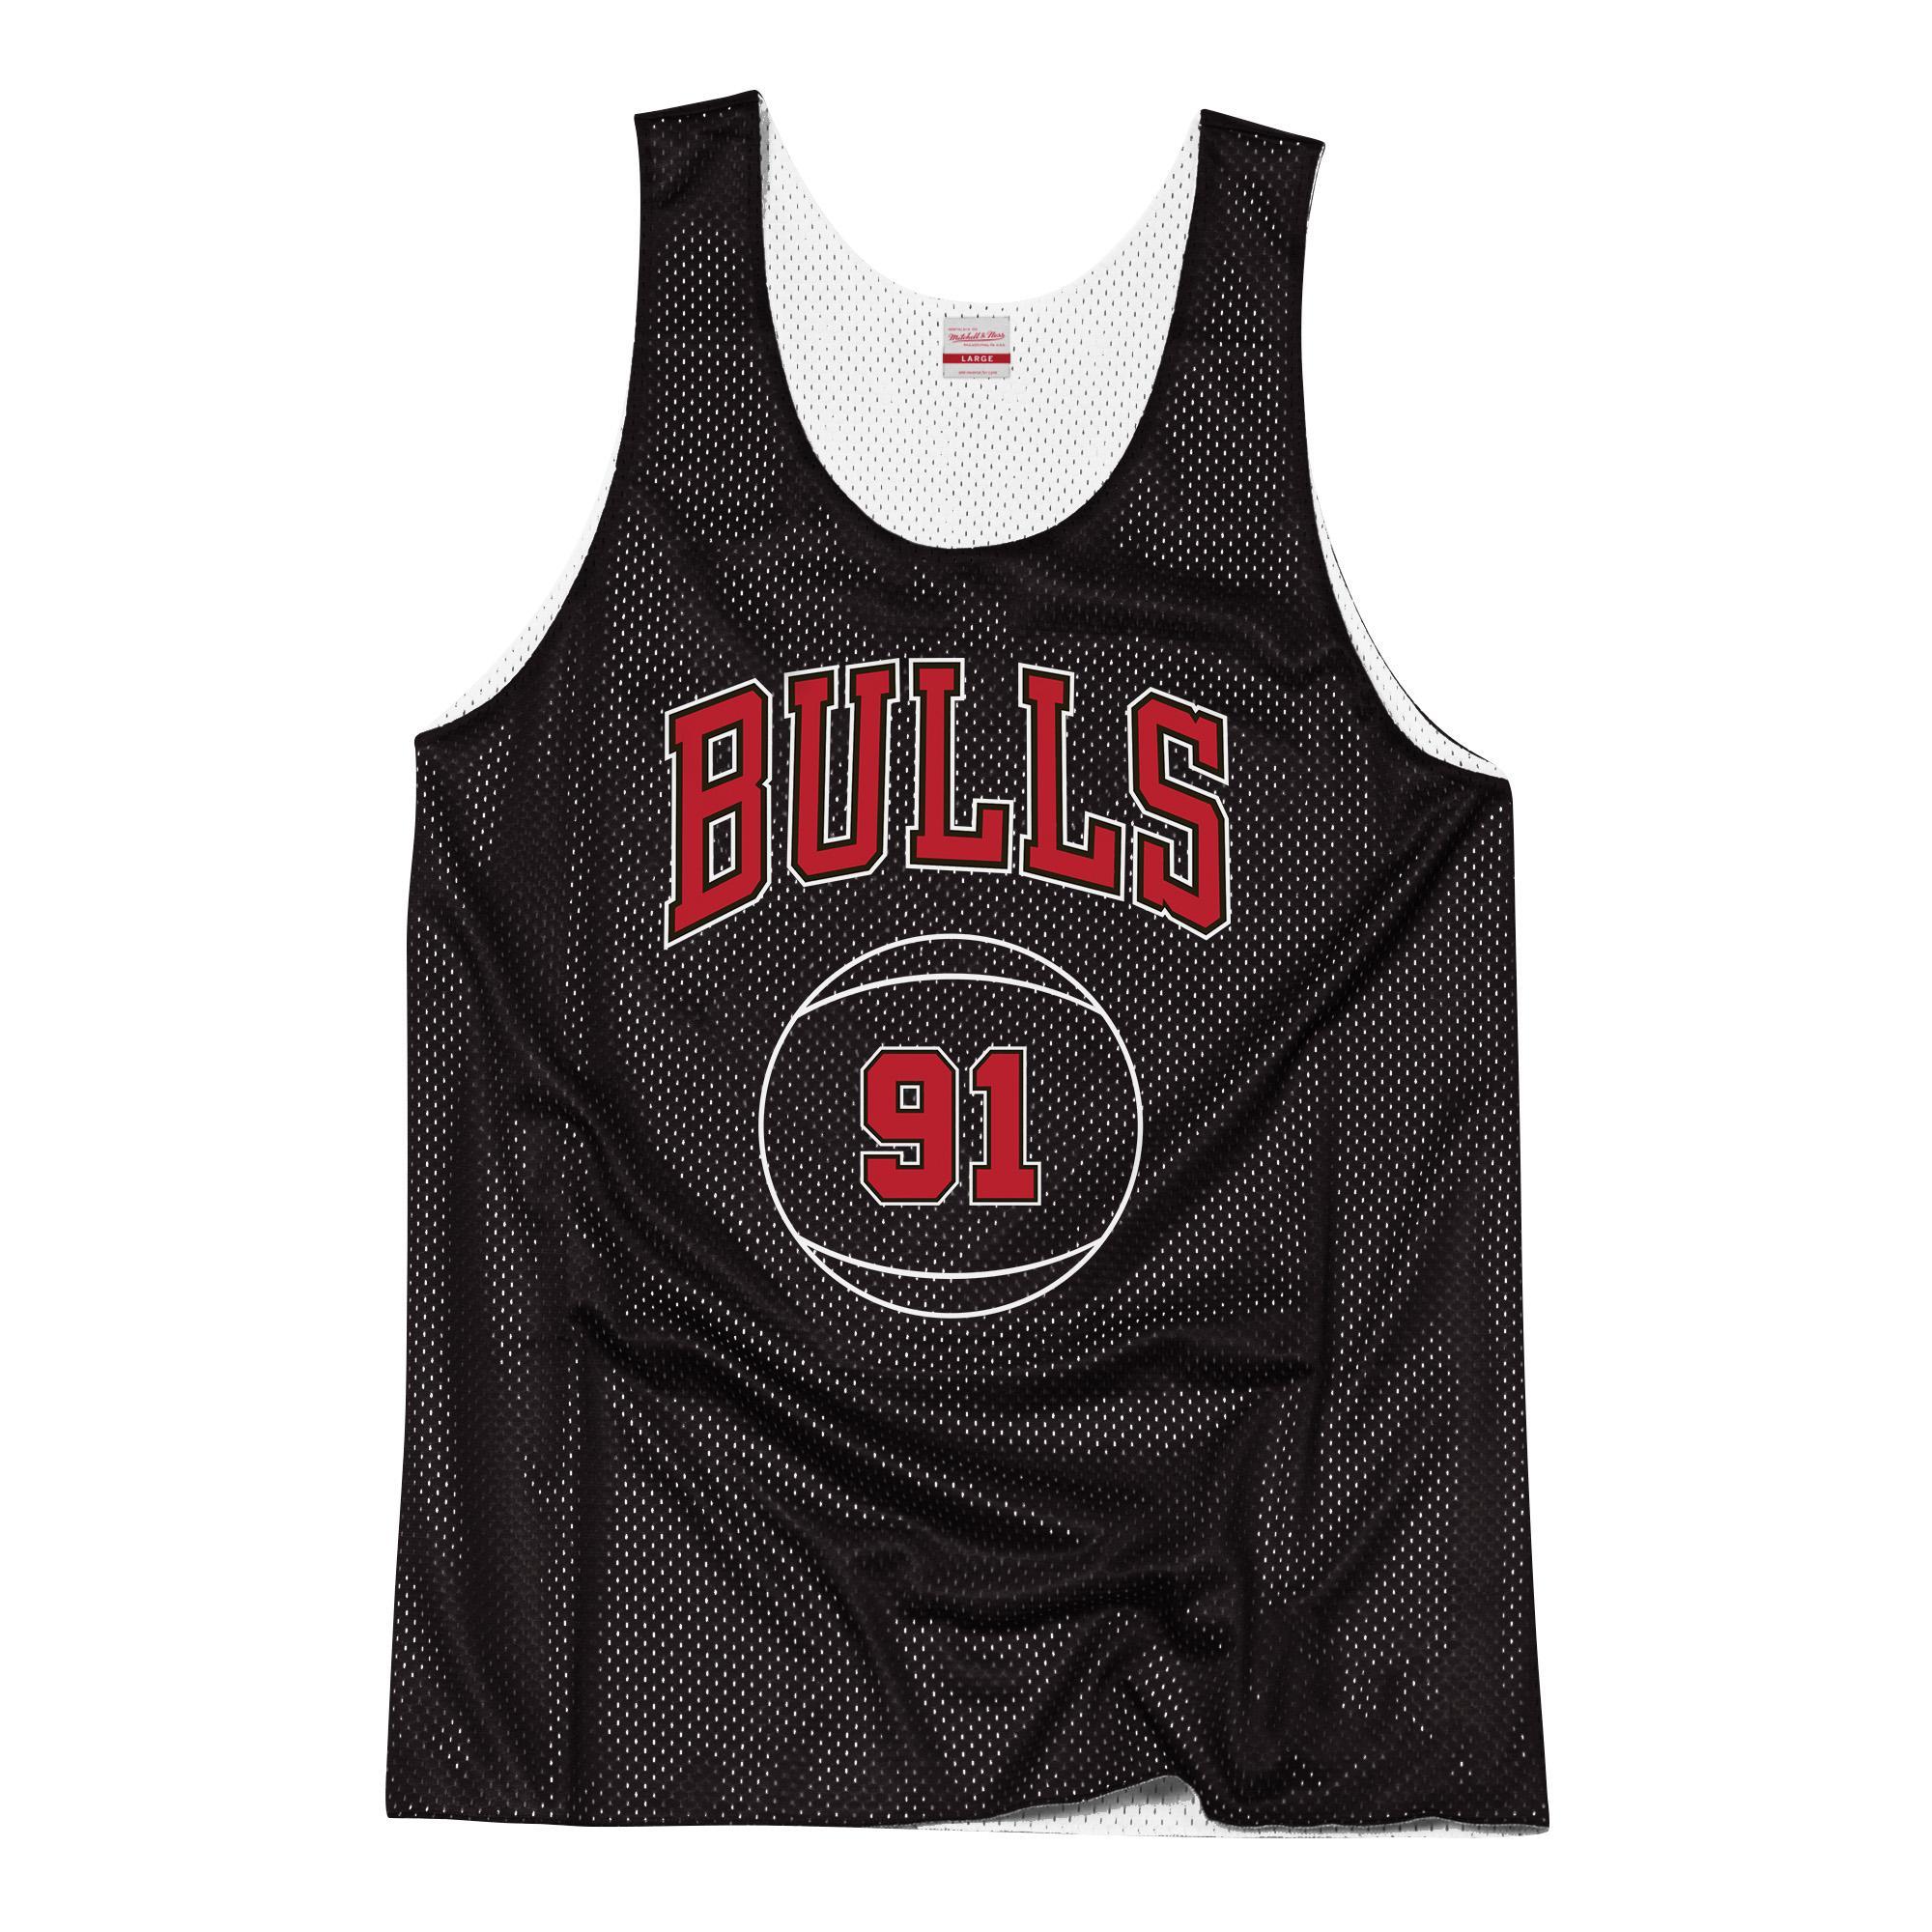 fcd4d4f7eb9 Mitchell & Ness Nostalgia Co. | Reversible Mesh Tank Top - Chicago Bulls